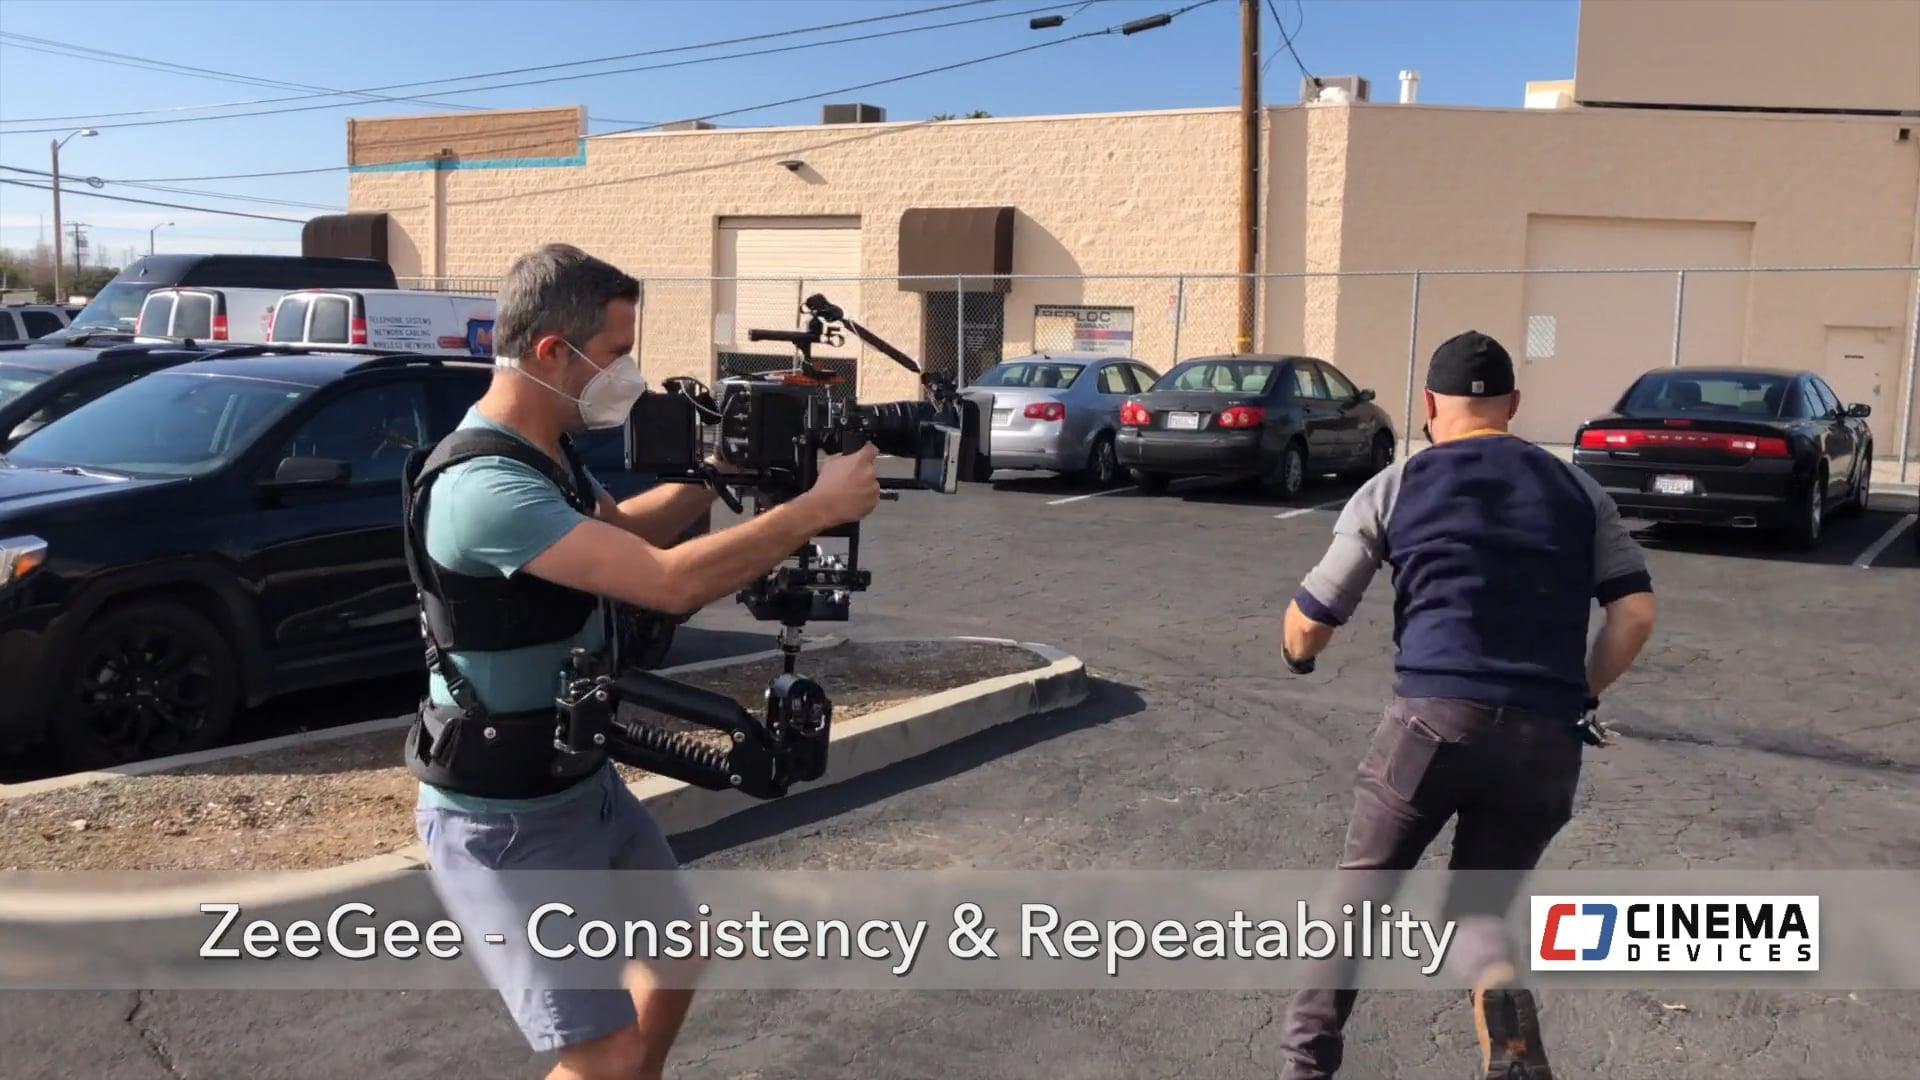 Consistency & Repeatability